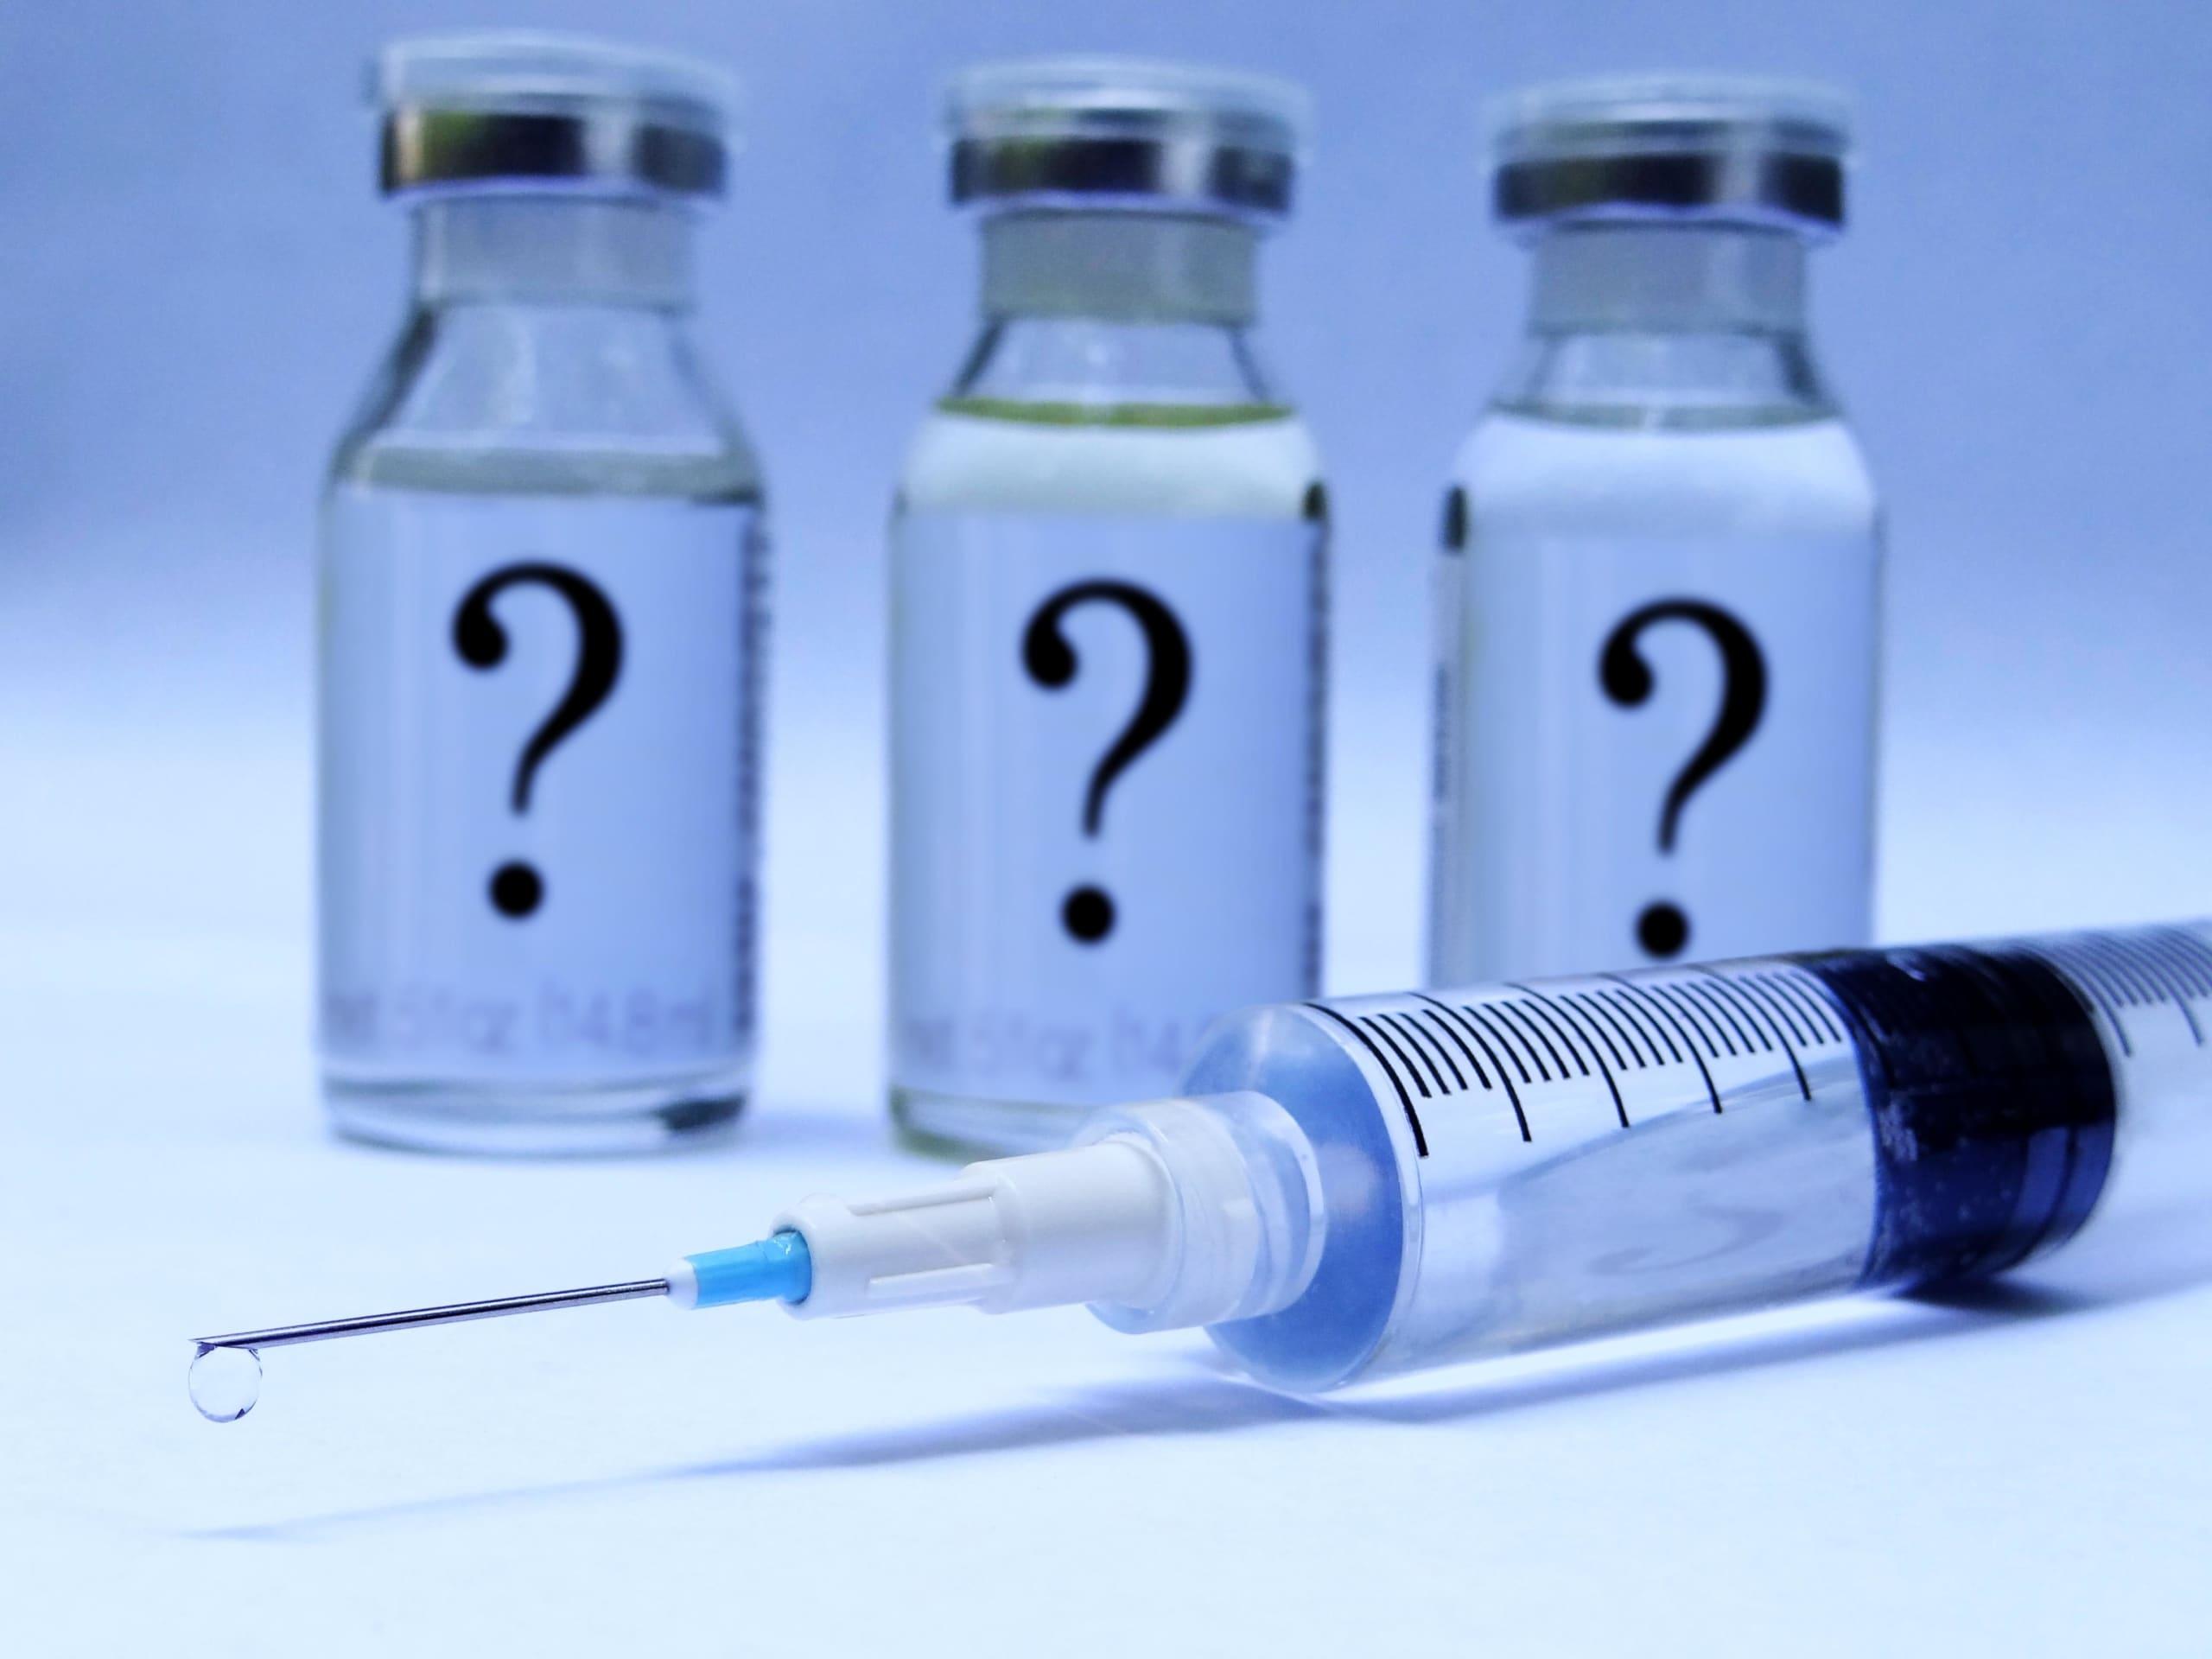 syringe and vaccine